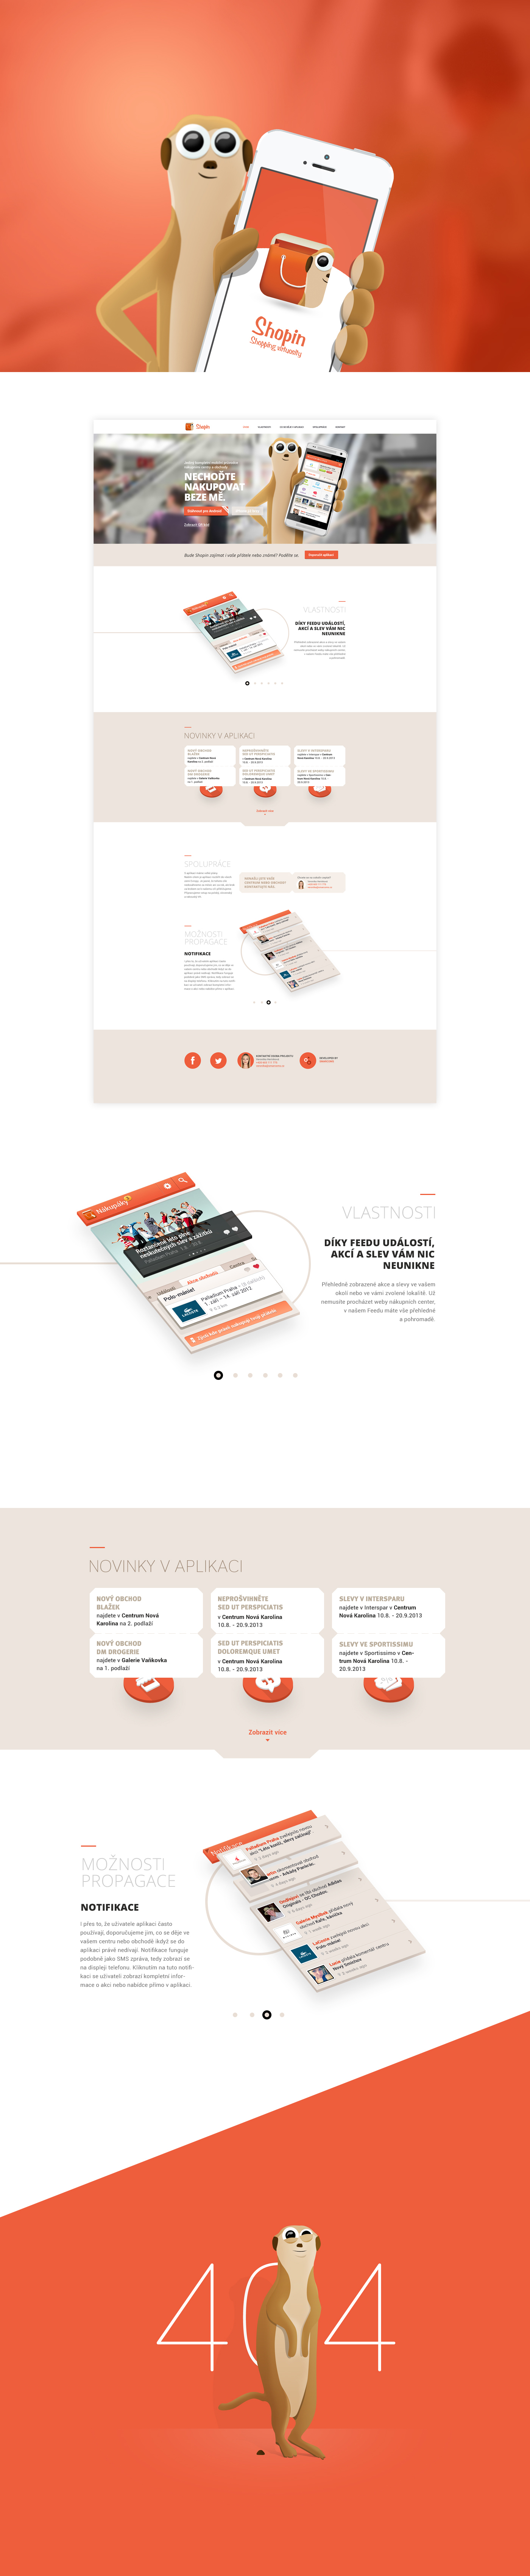 Shopping centre flat 404page orange mobile app microsite Responsive fading meerkat